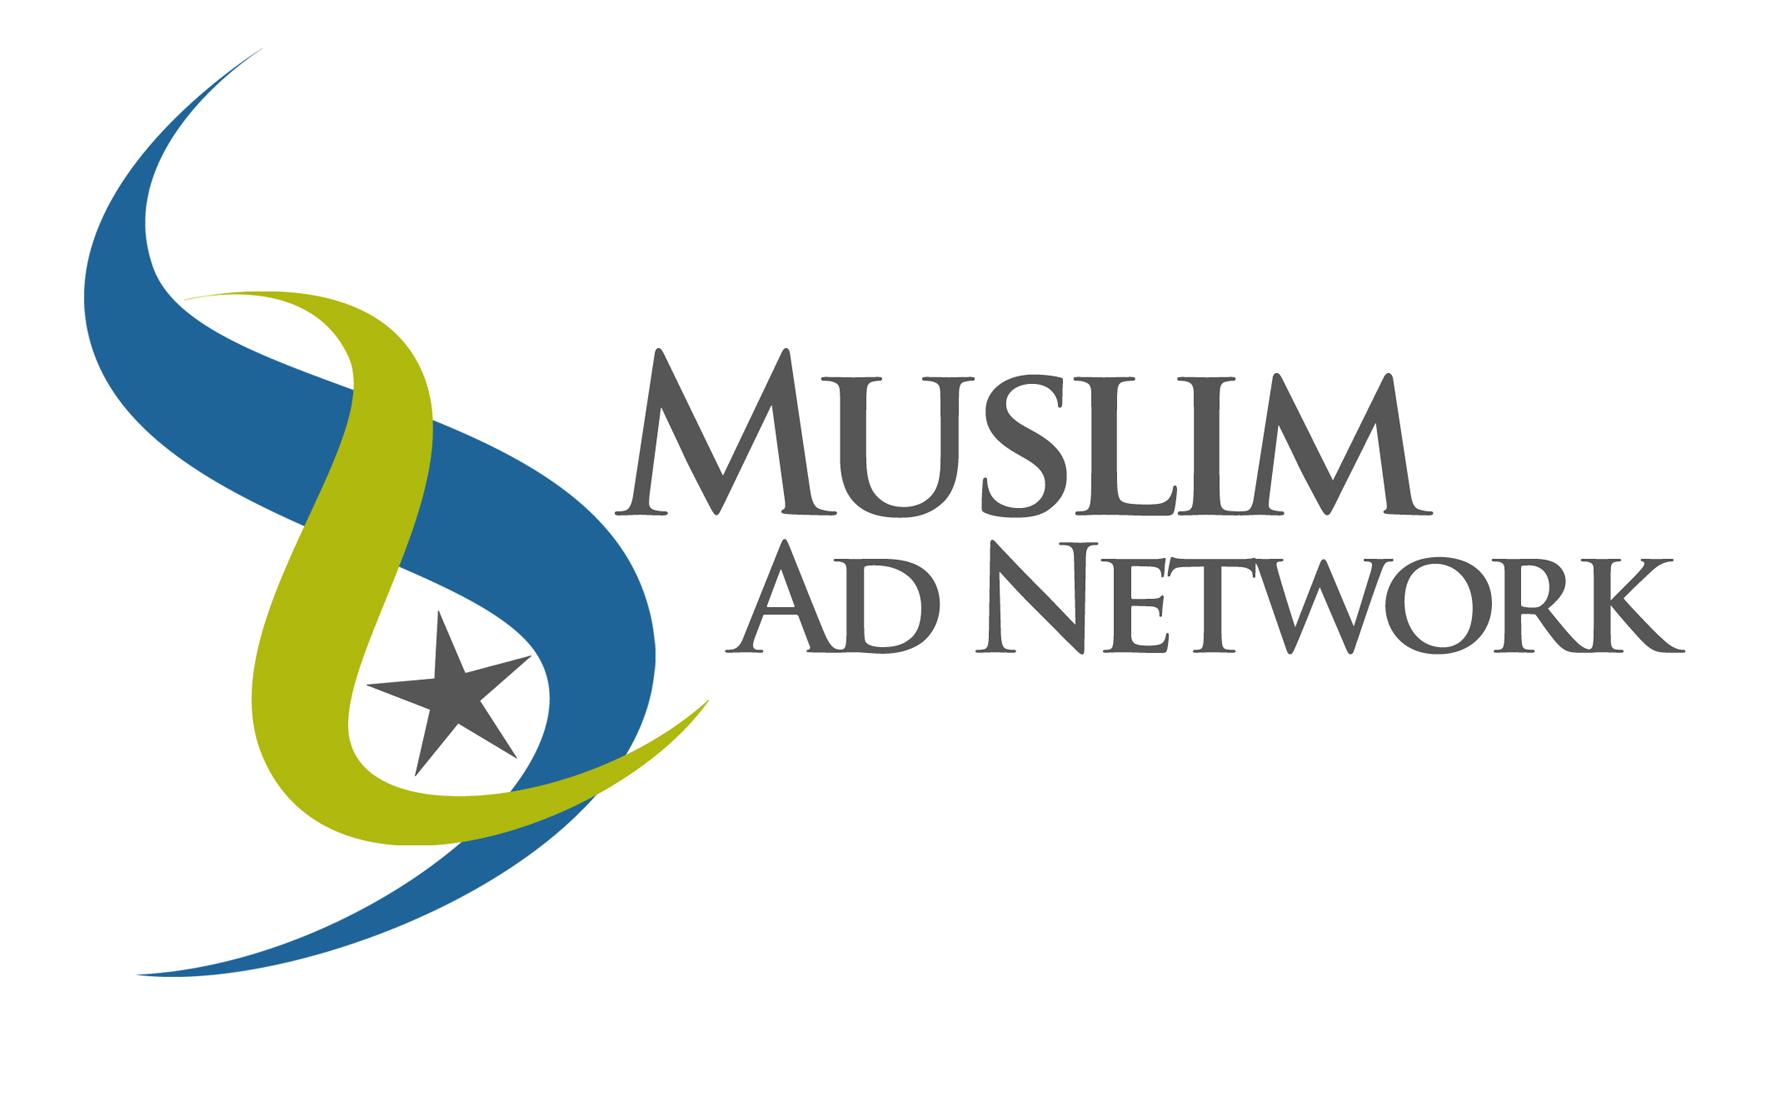 Muslim Ad Network